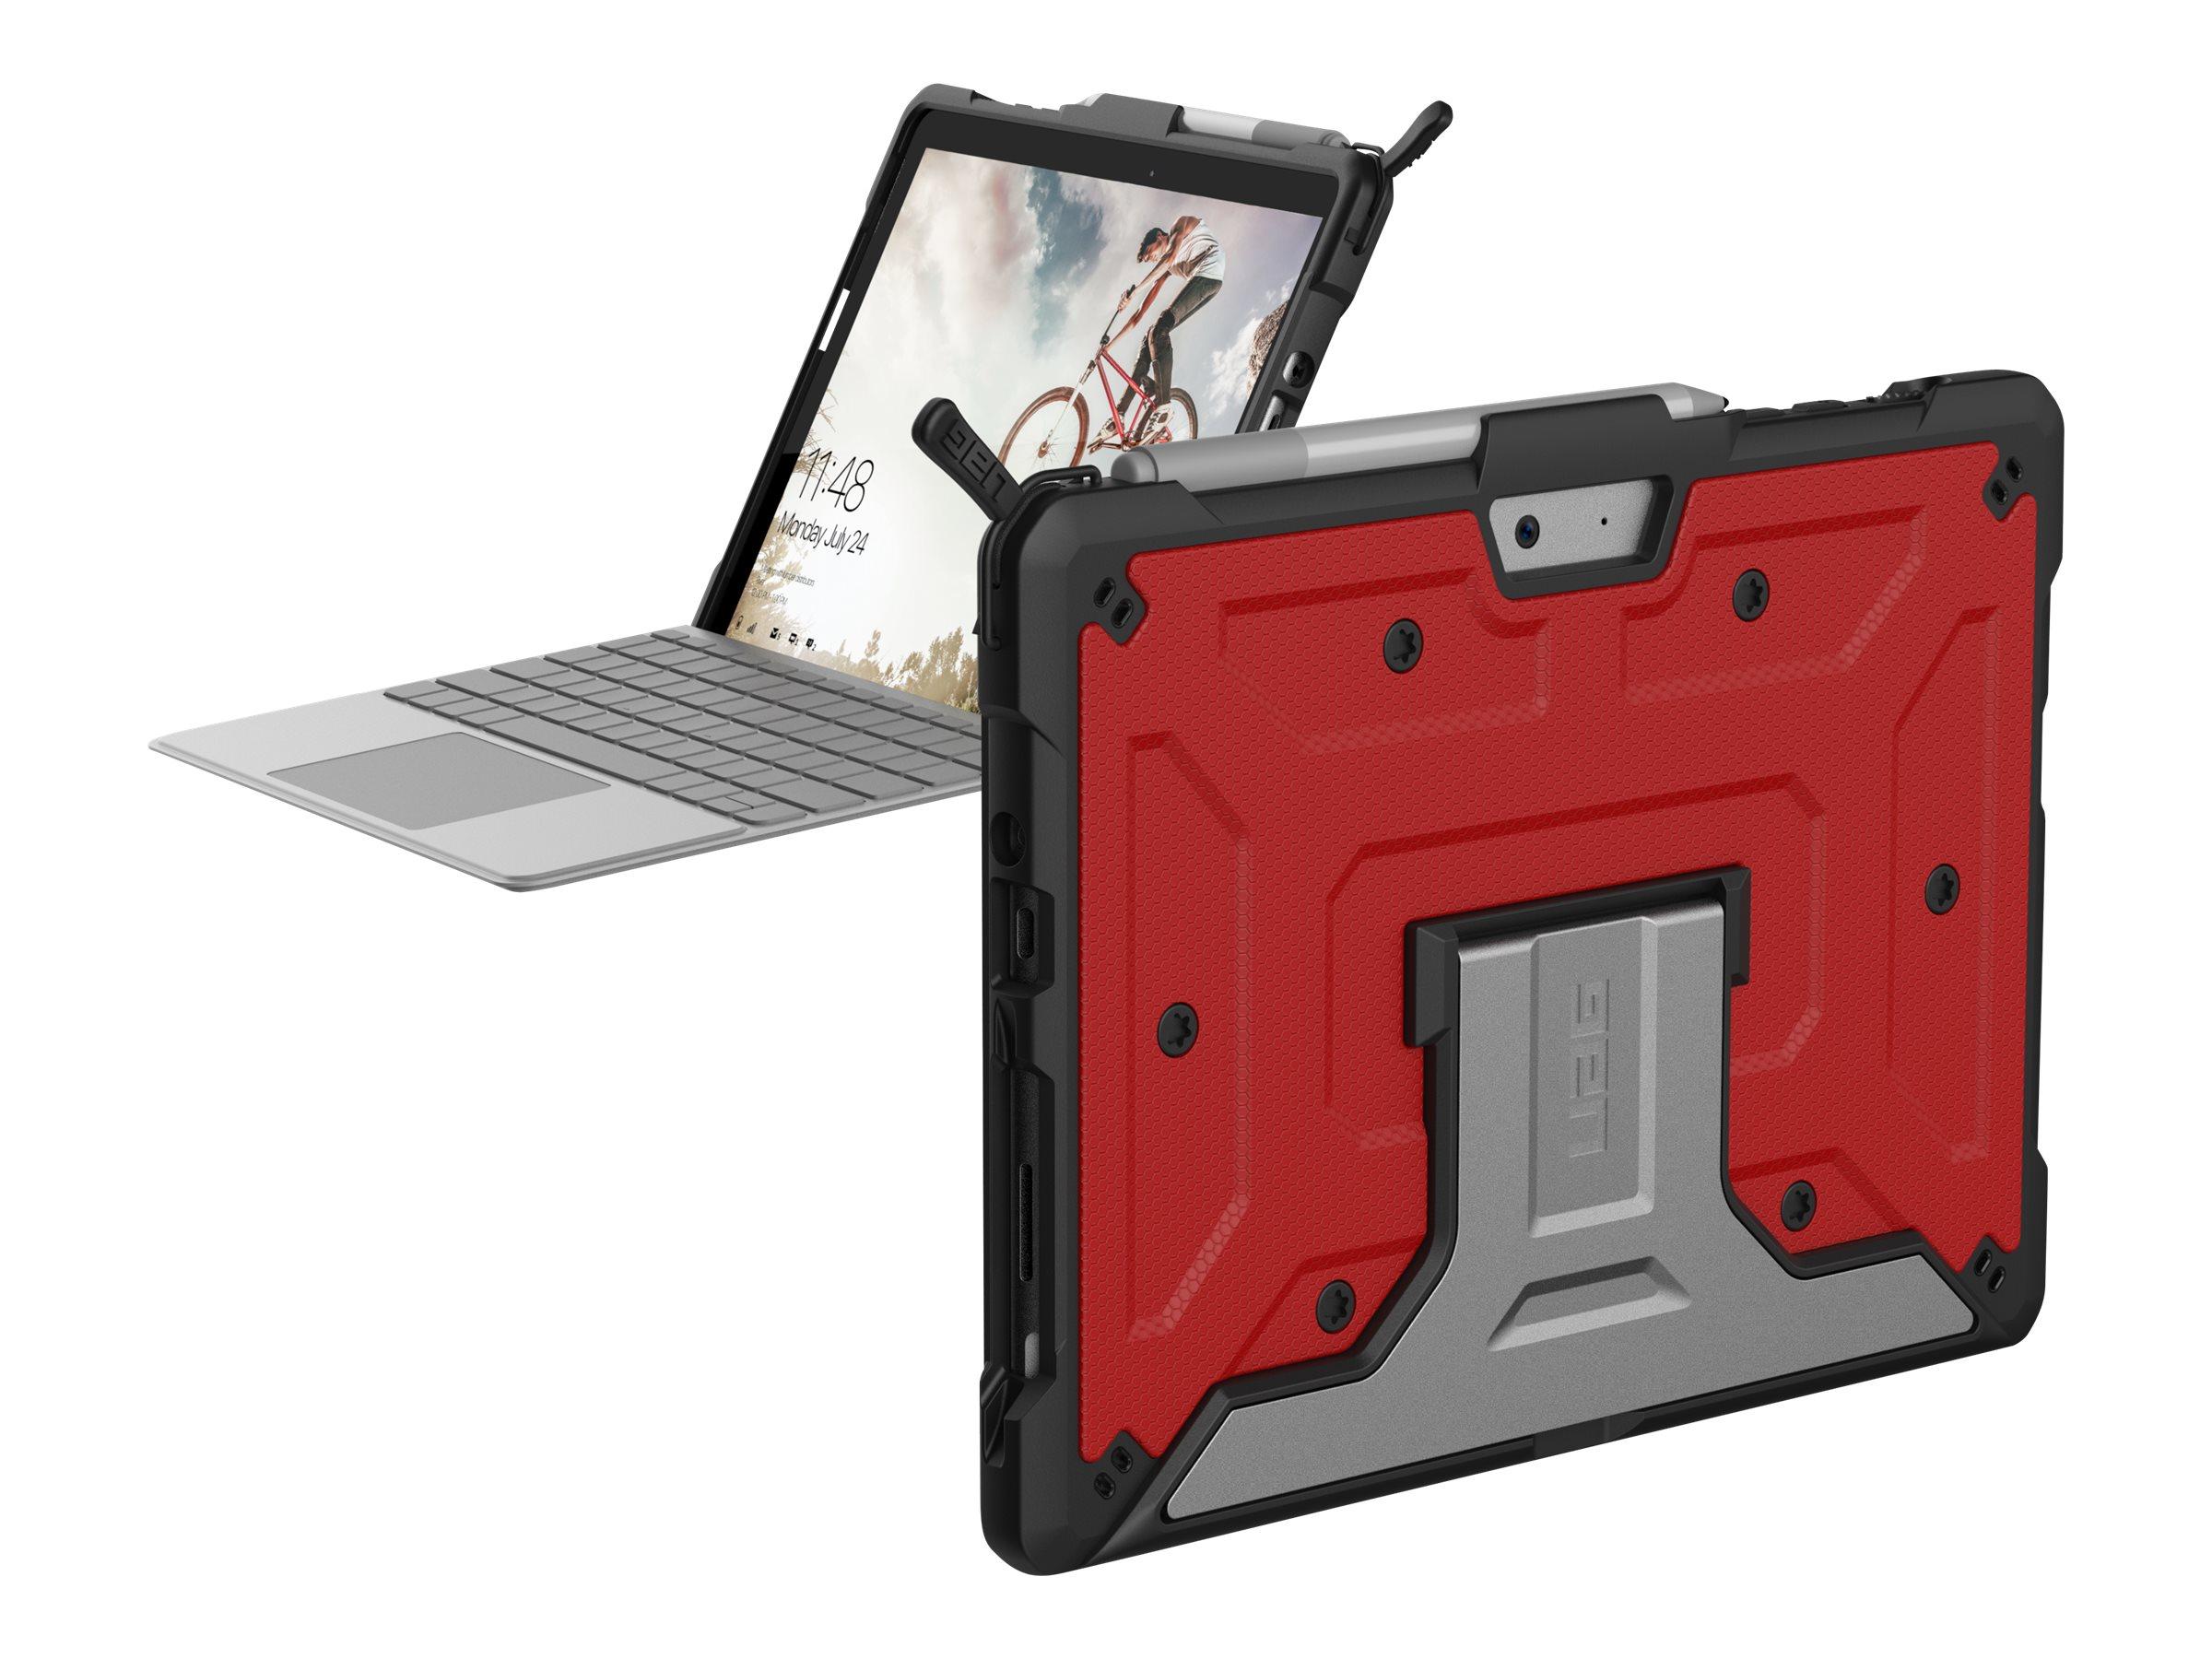 UAG Metropolis Series Rugged Case for Microsoft Surface Go - Magma - Hintere Abdeckung für Tablet - widerstandsfähig - Aluminium